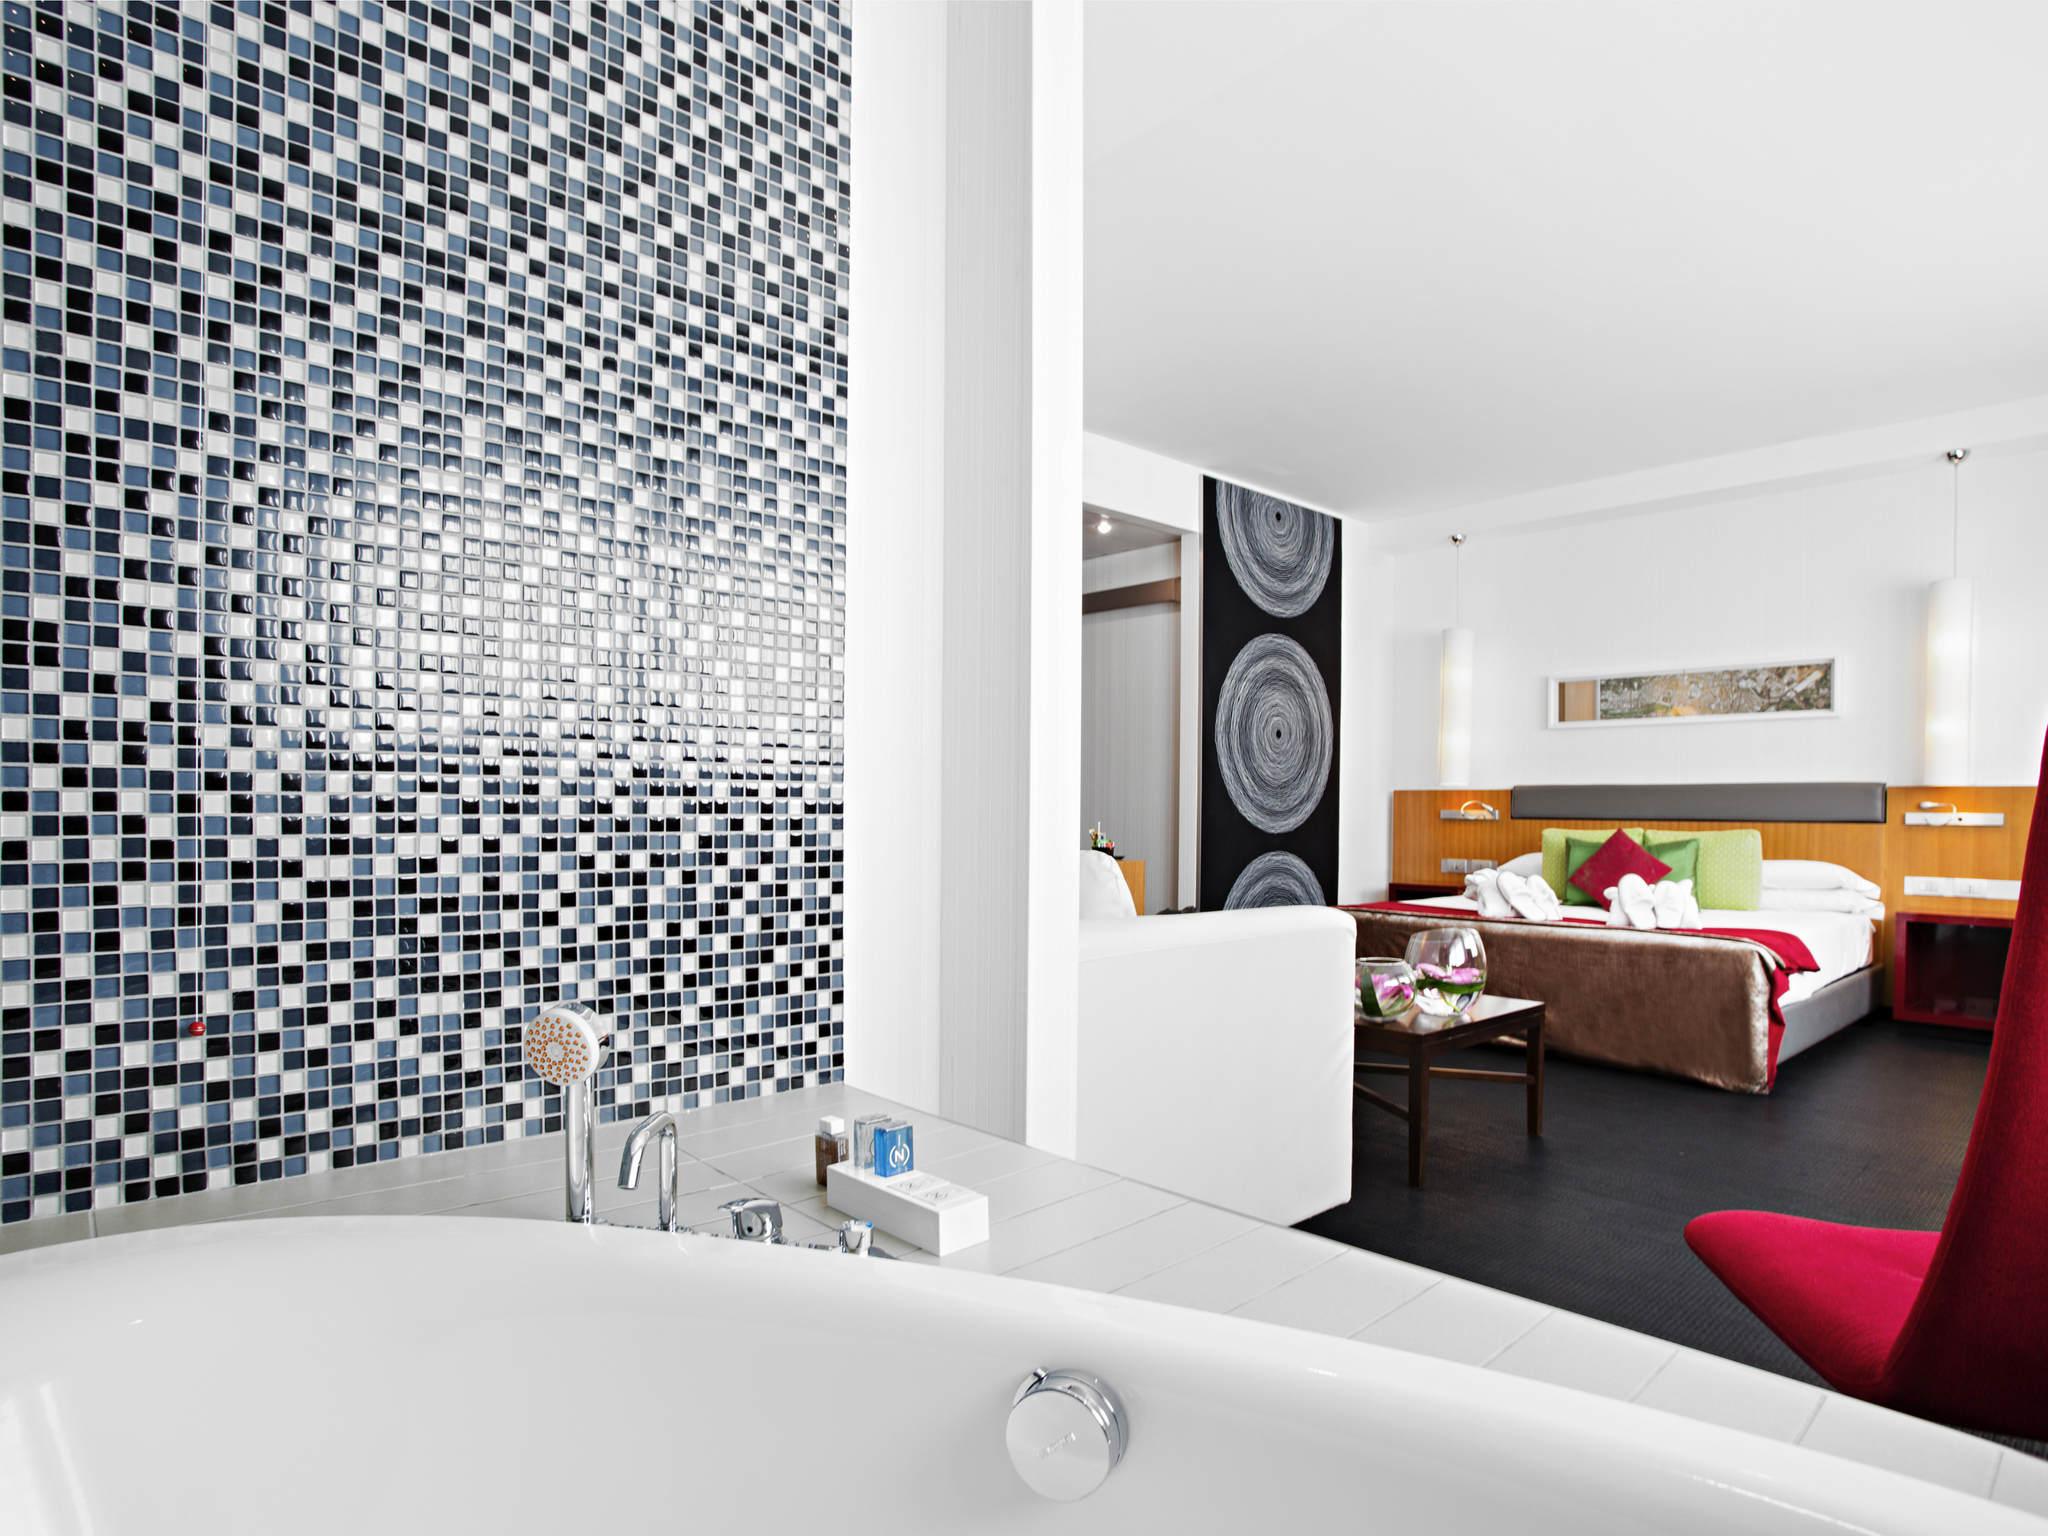 Novotel Rome Eur hotel